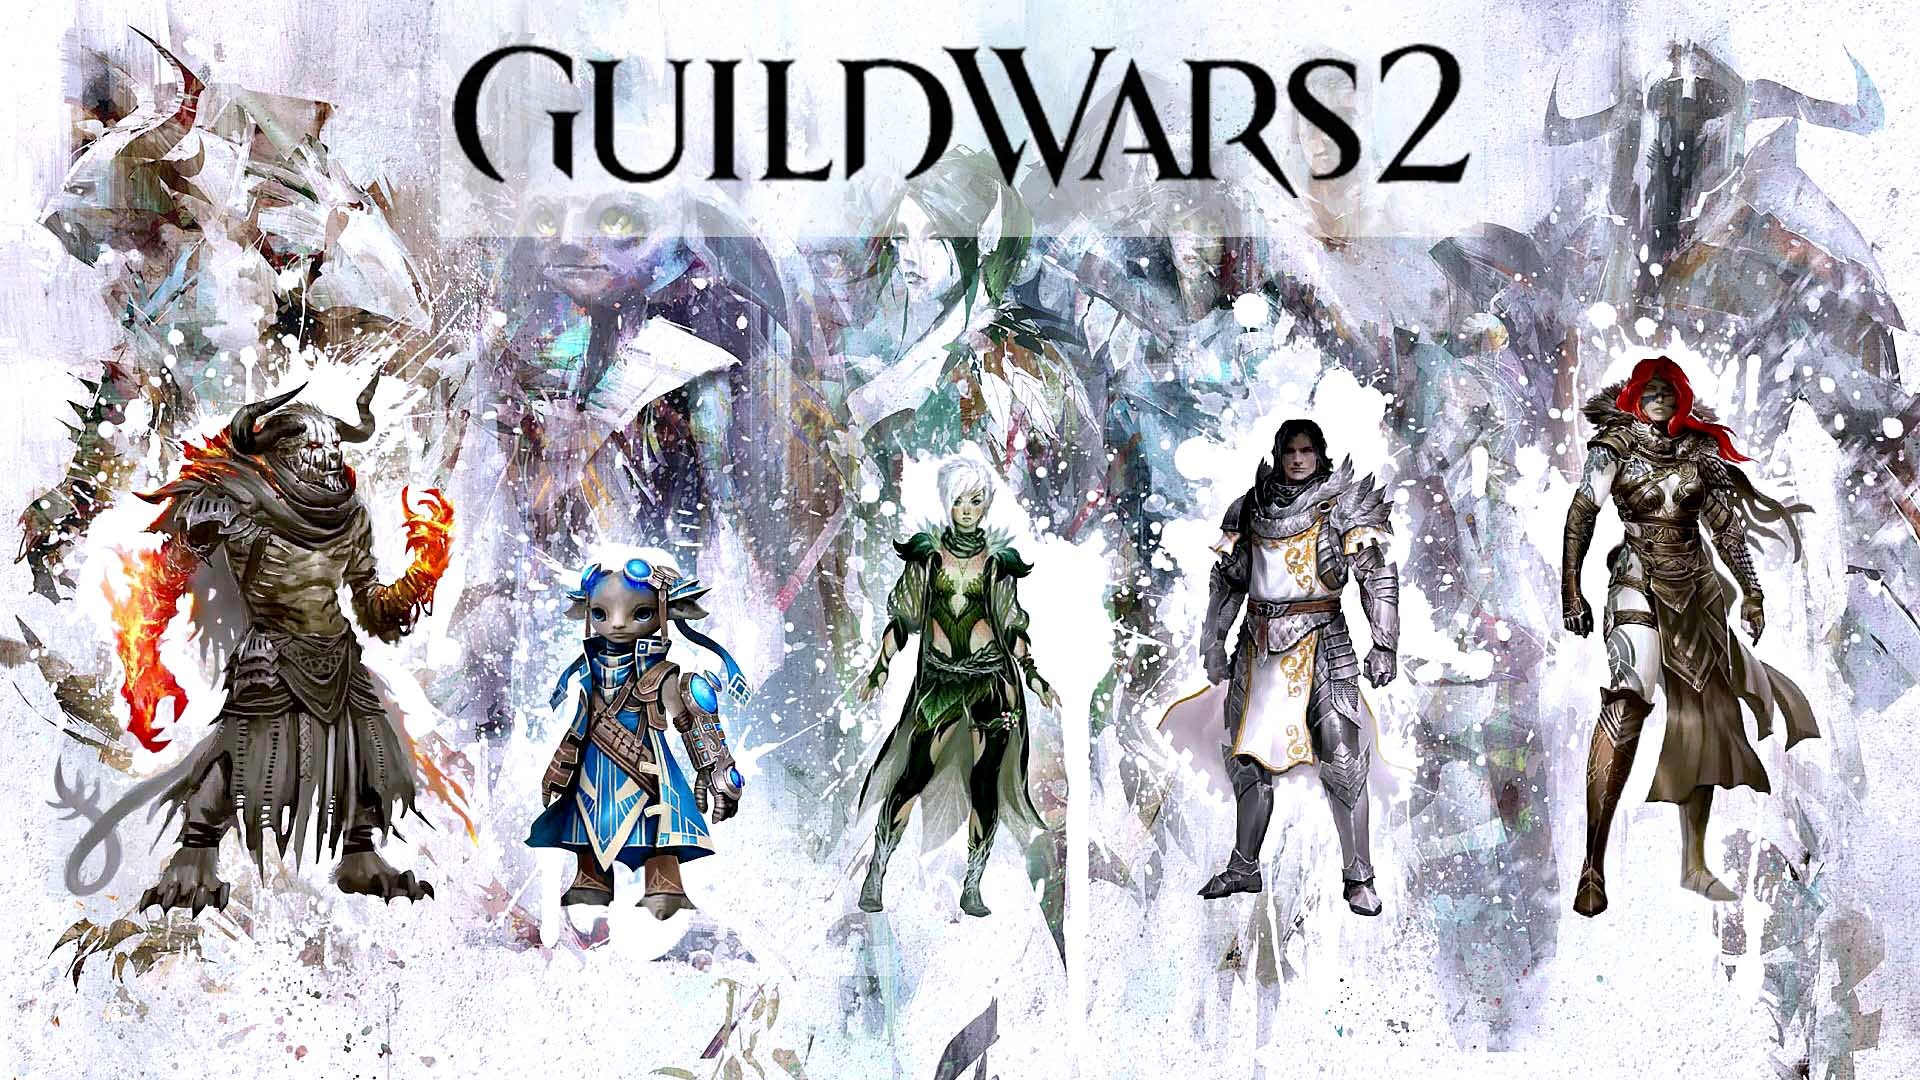 Hd Guild Wars 2 Wallpaper 84 Images